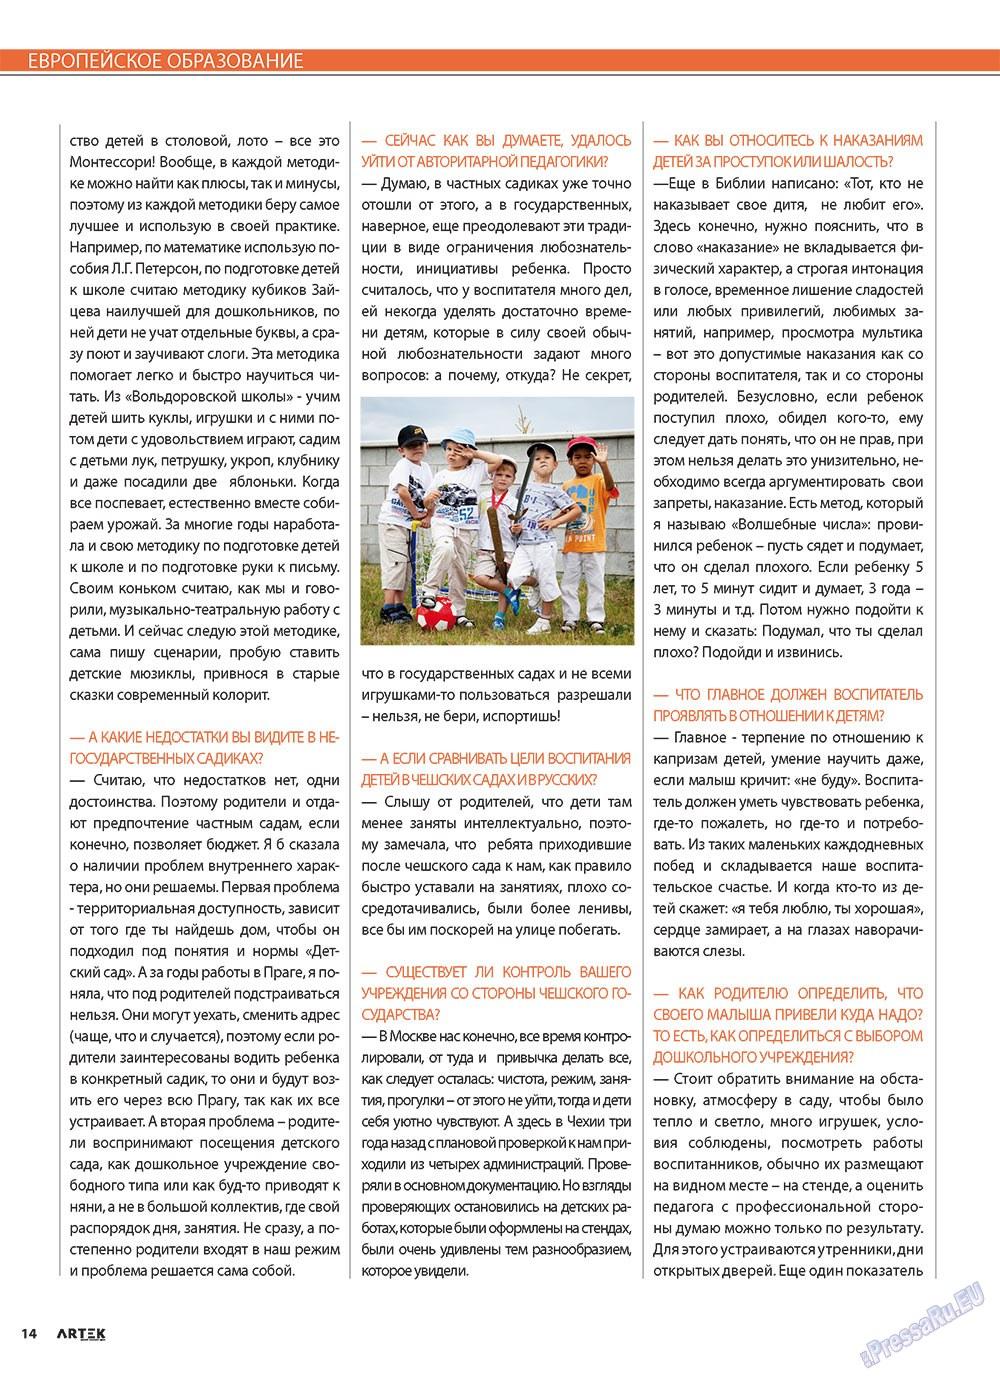 Артек (журнал). 2010 год, номер 4, стр. 16